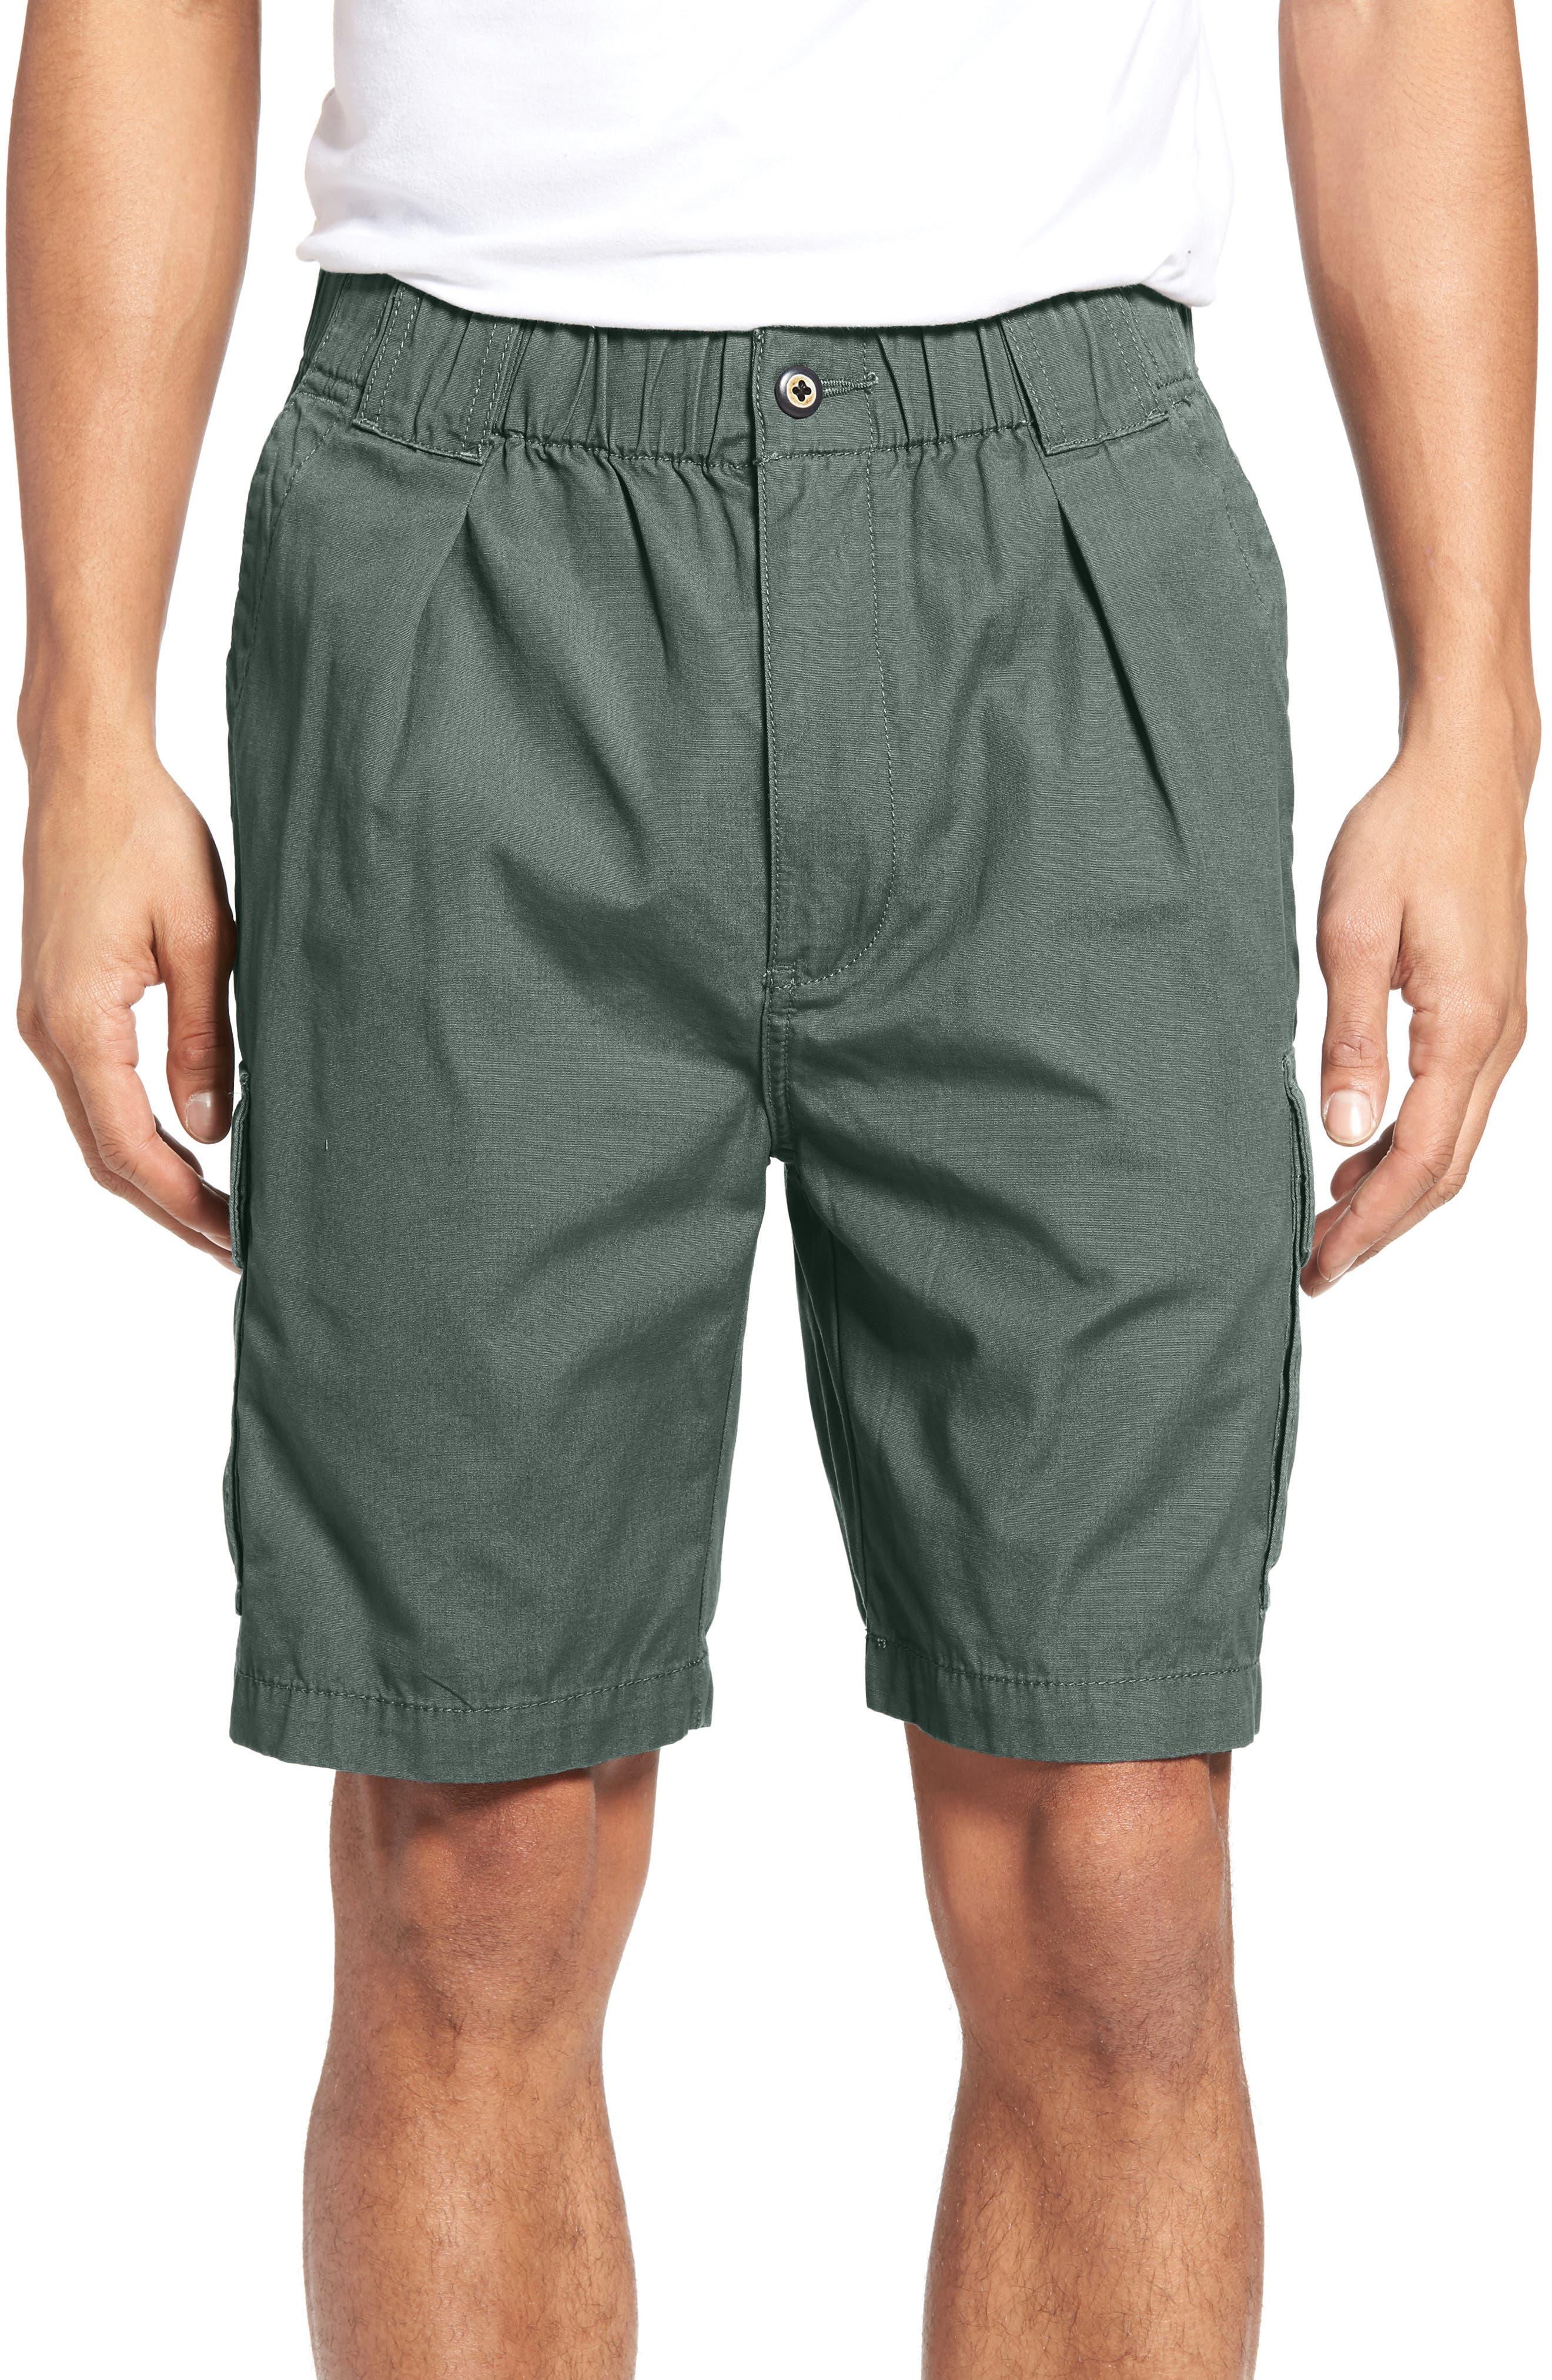 Alternate Image 1 Selected - Tommy Bahama 'Survivor' Cargo Shorts (Big & Tall)